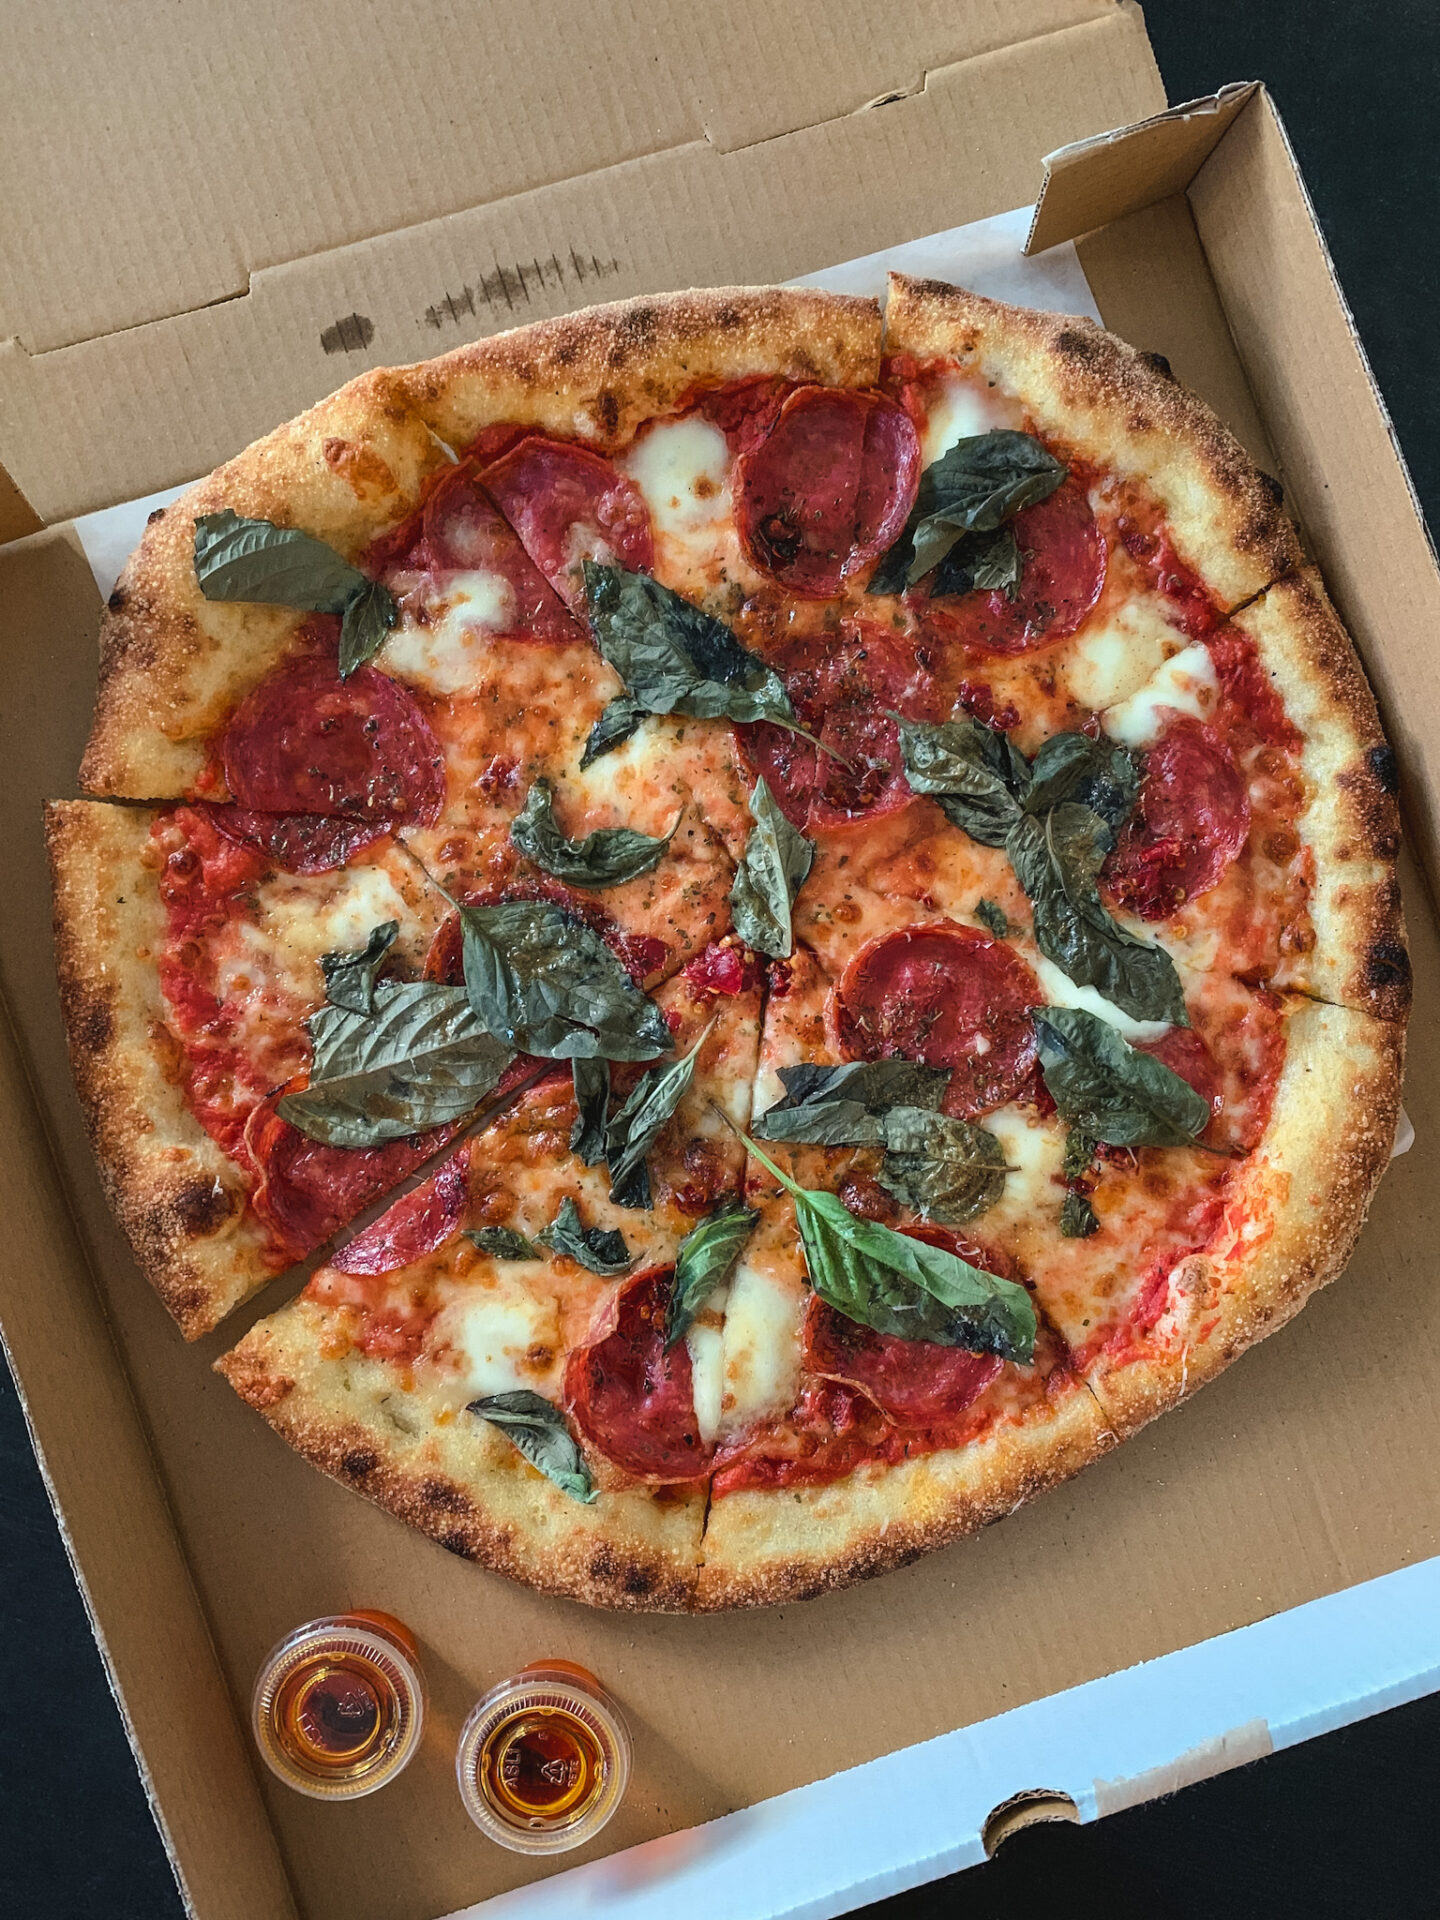 NEO-NY Genoa Salami from Pizzeria Libretto in Toronto